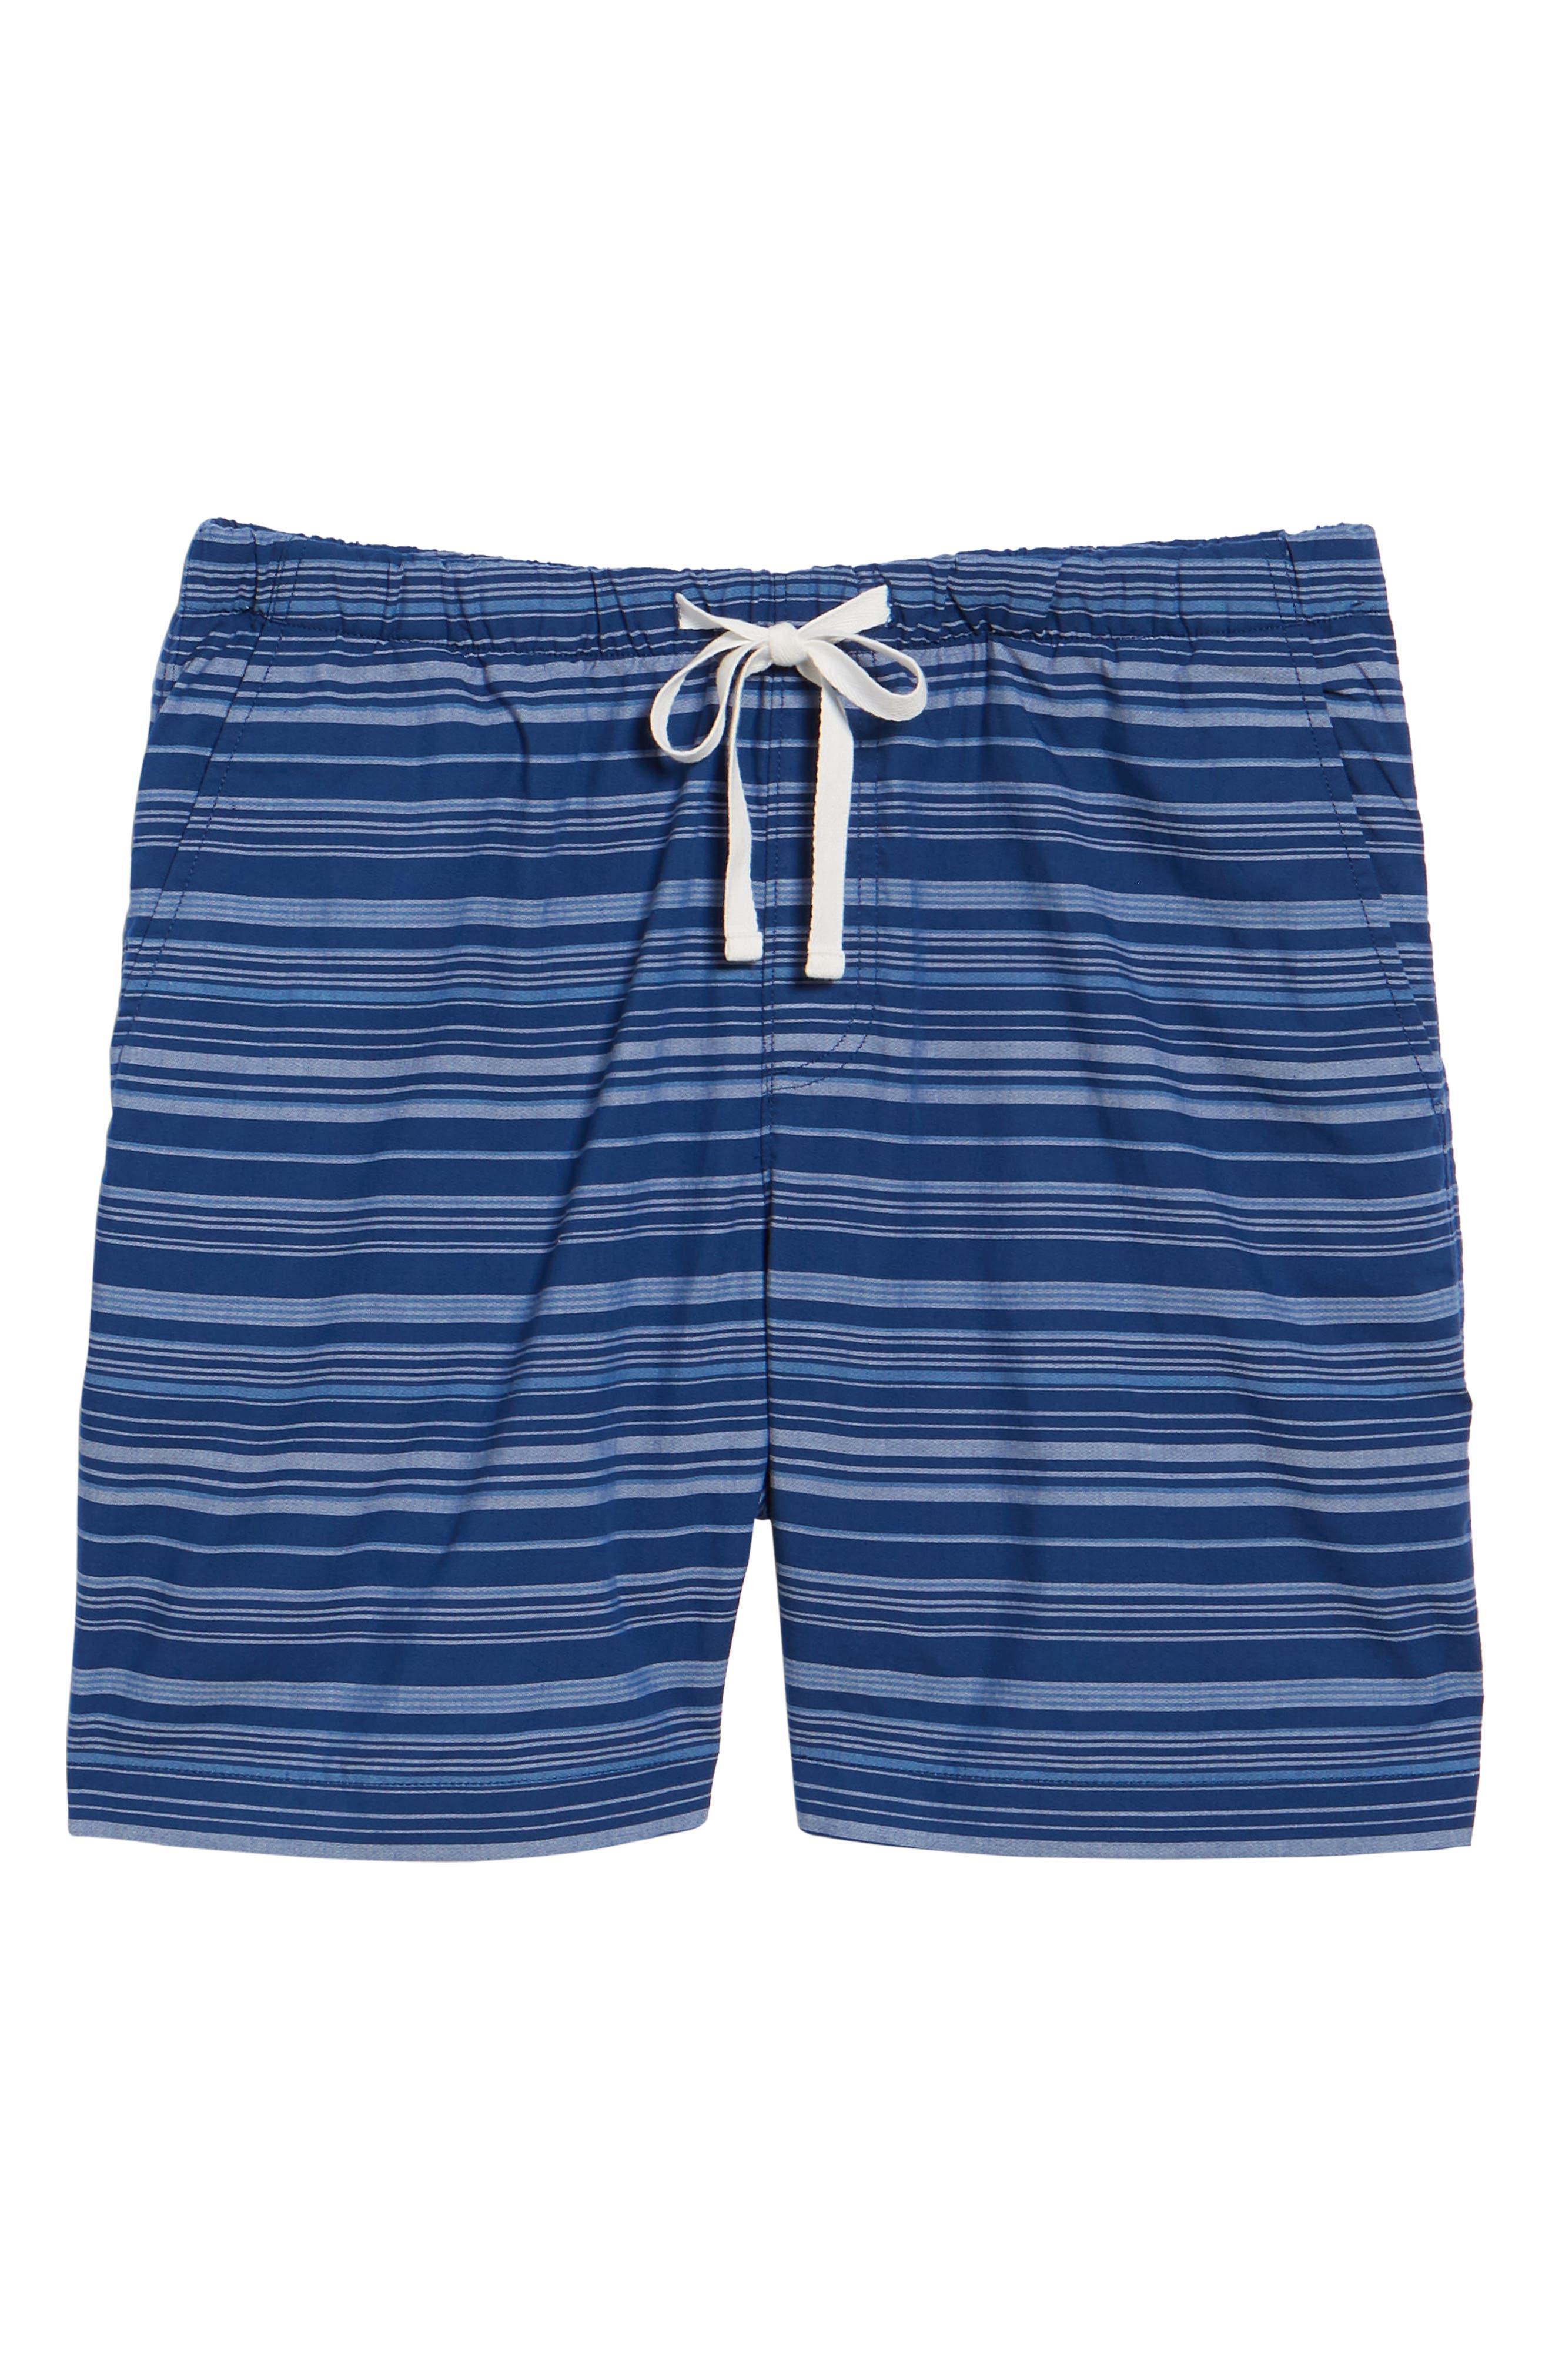 Hammock Board Shorts,                             Alternate thumbnail 6, color,                             425